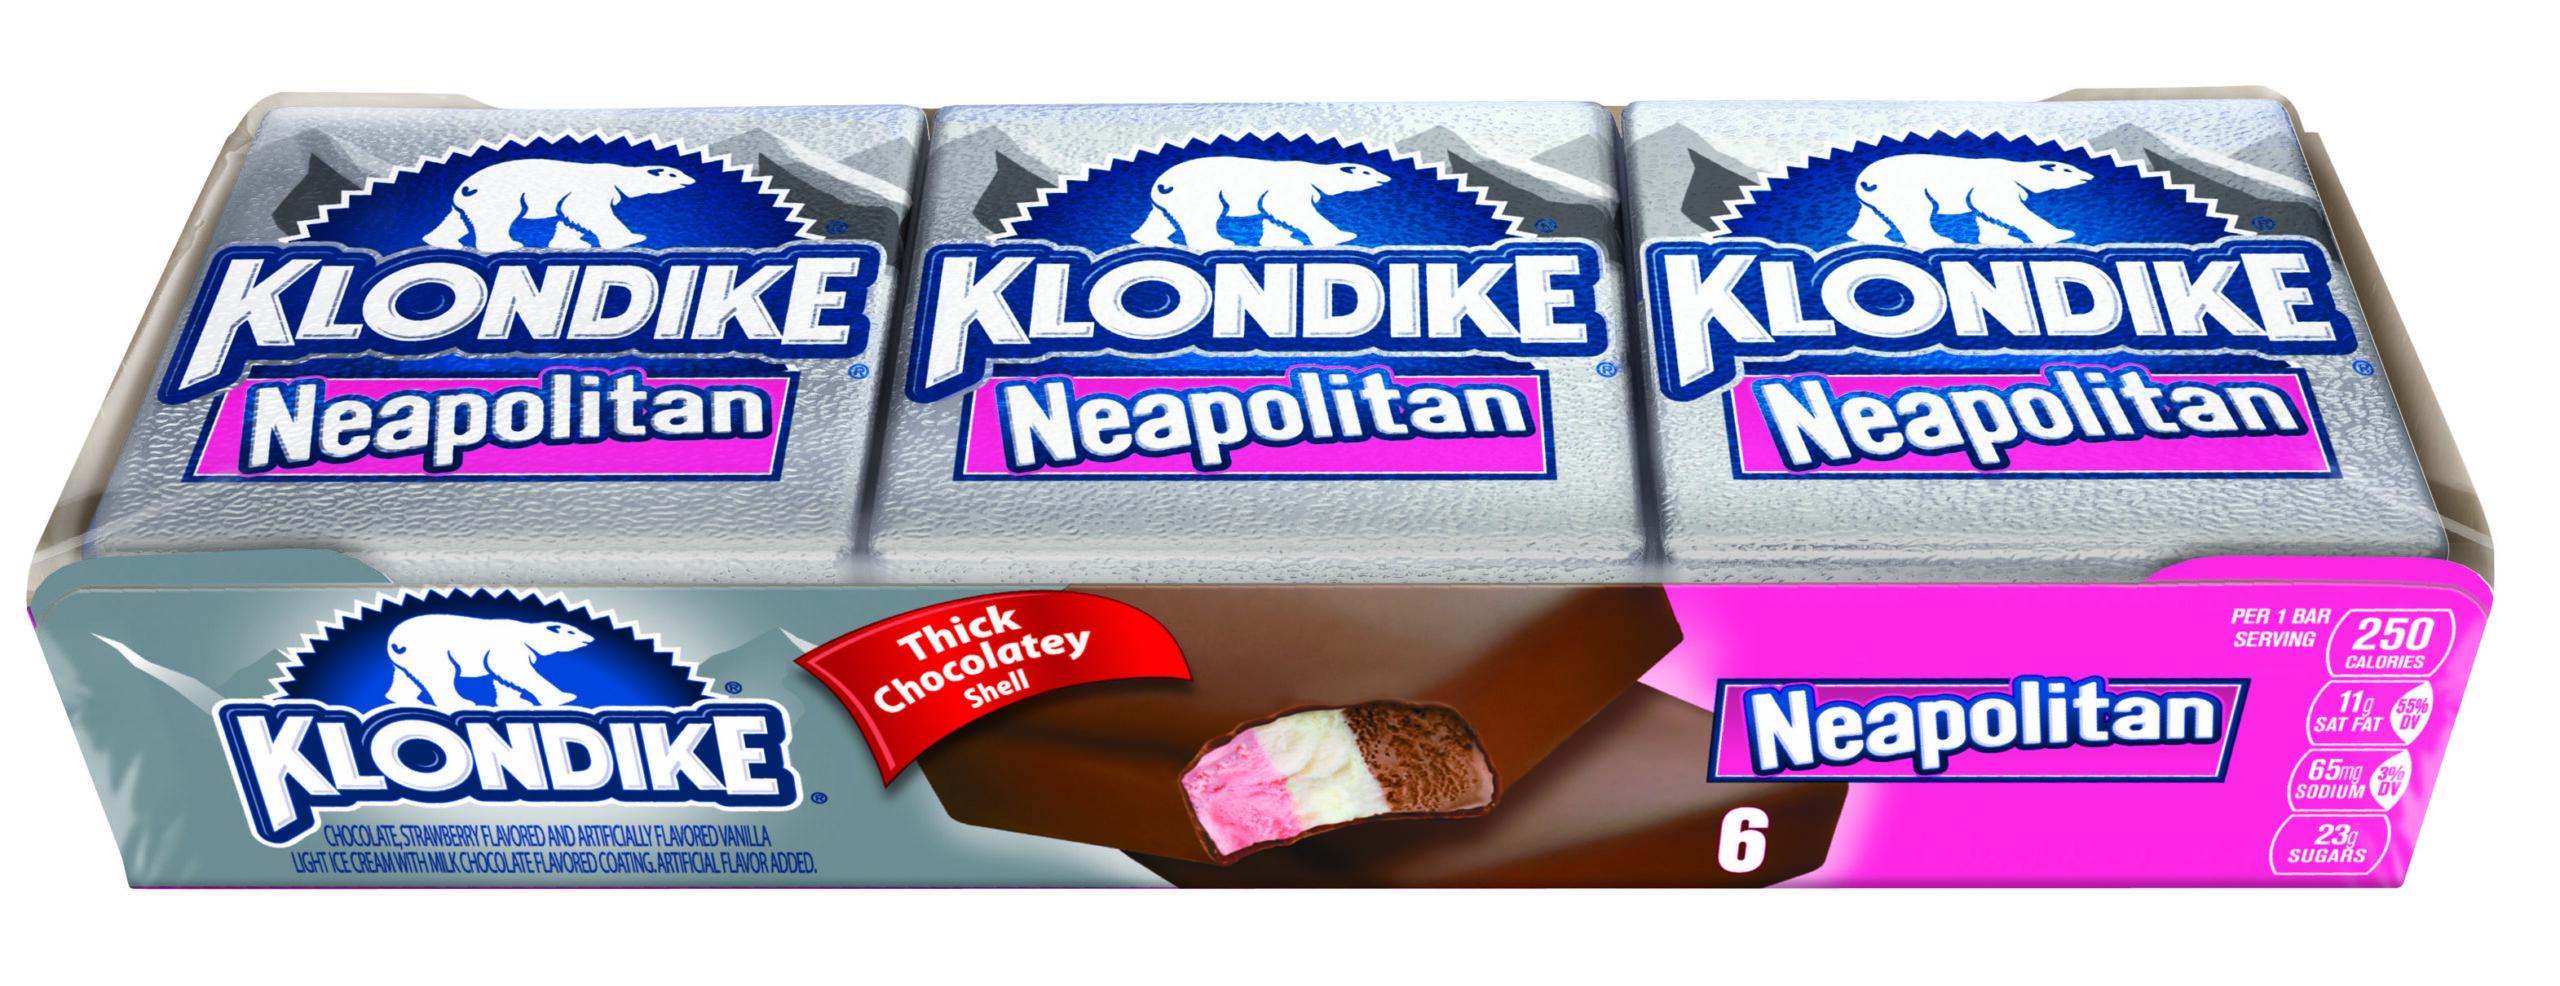 Klondike Neapolitan Bars (2)